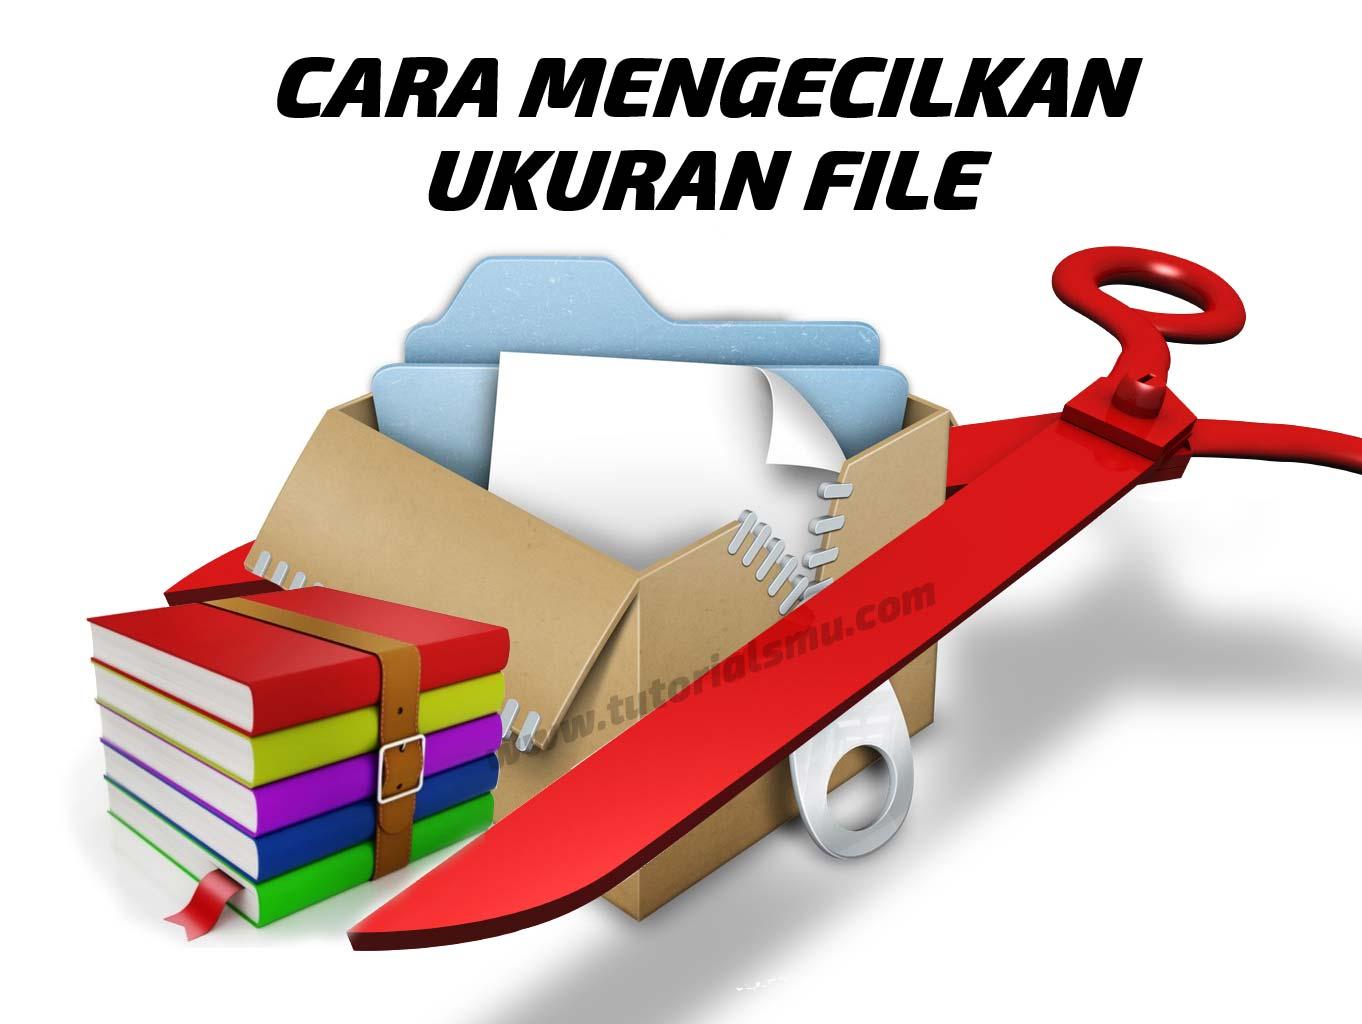 Cara Mengecilkan Ukuran File Dan Mengkompres File Menjadi Kecil Dengan Winrar Tutorialsmu